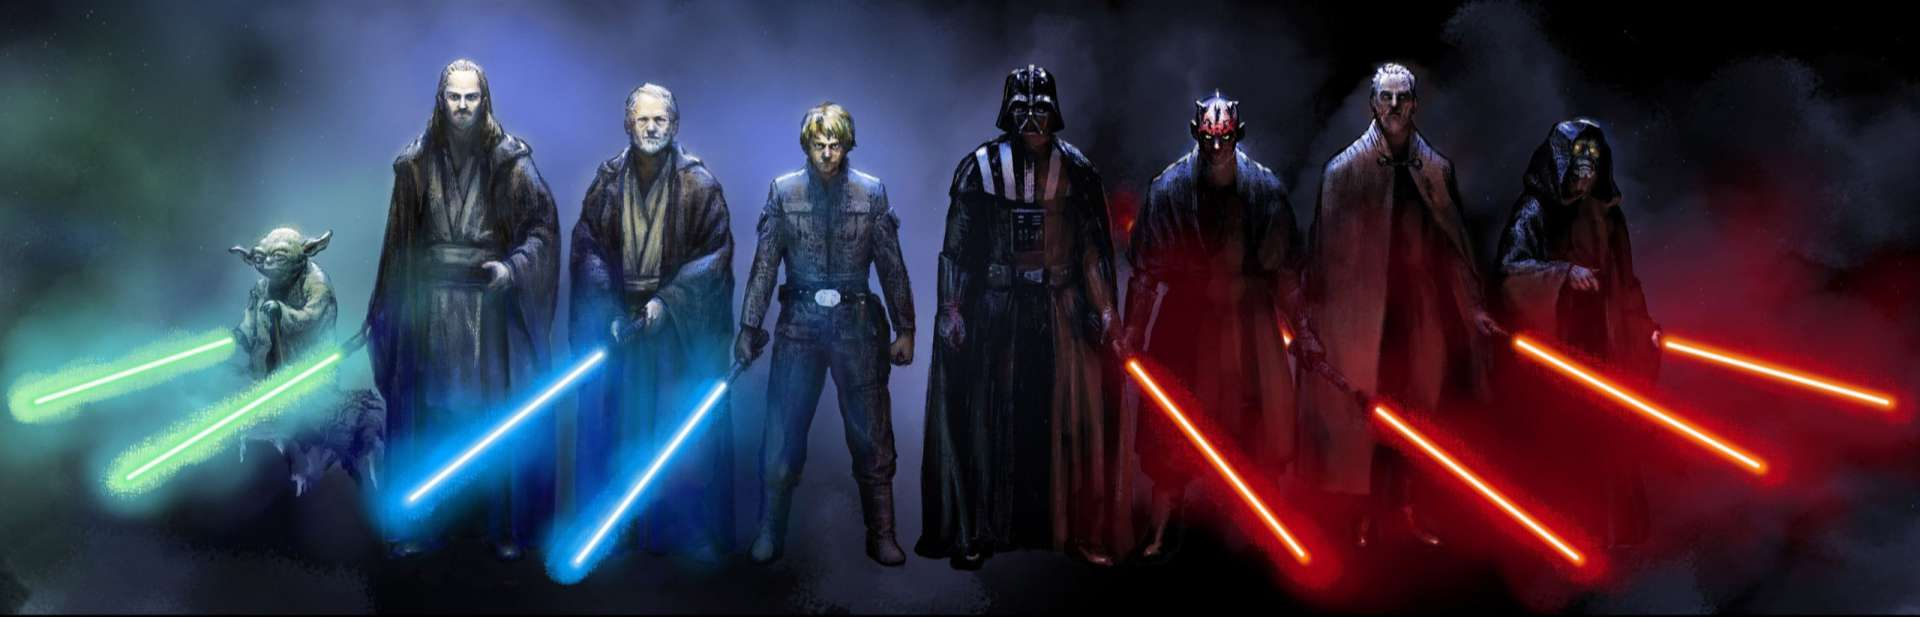 Star Wars Wallpaper 005